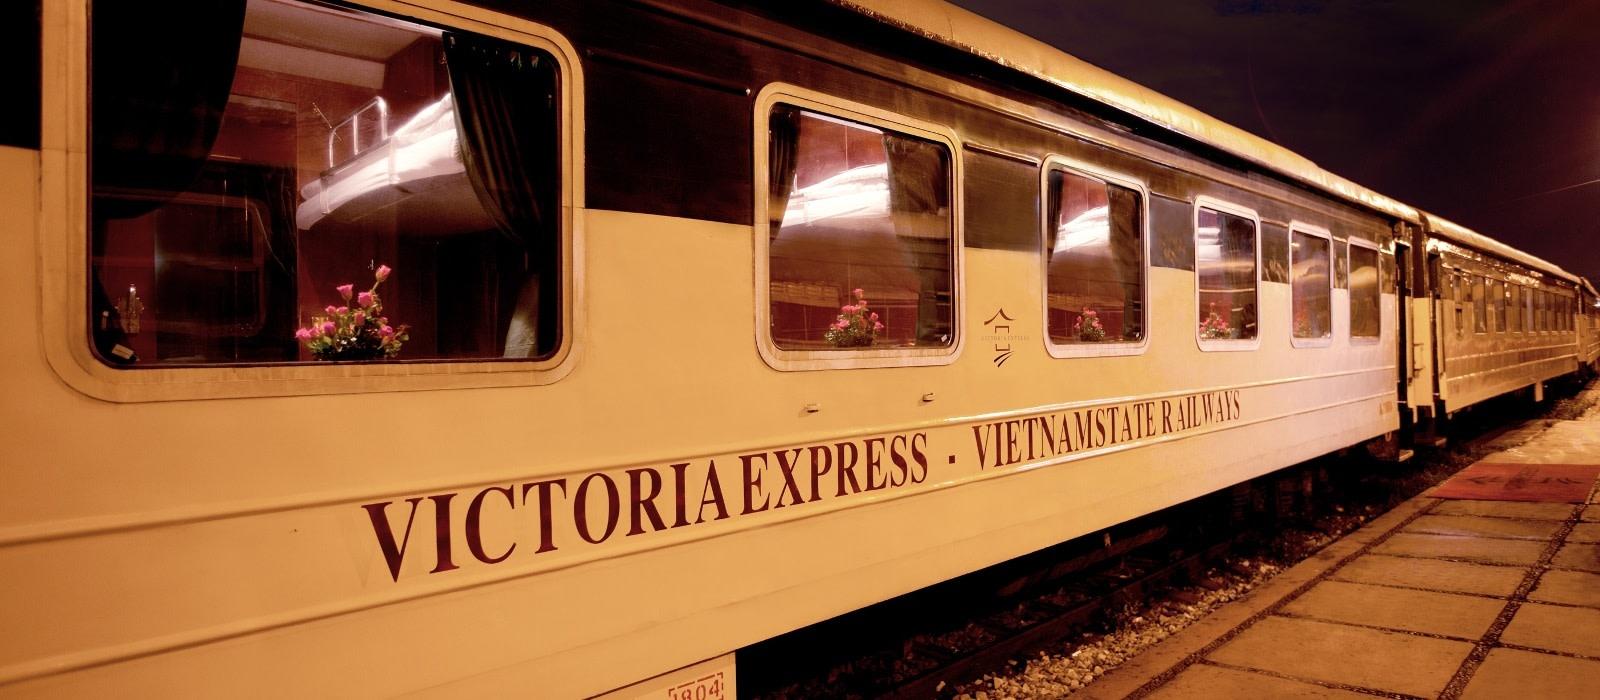 Hotel Victoria Express Zug (Hanoi – Laocai) Vietnam